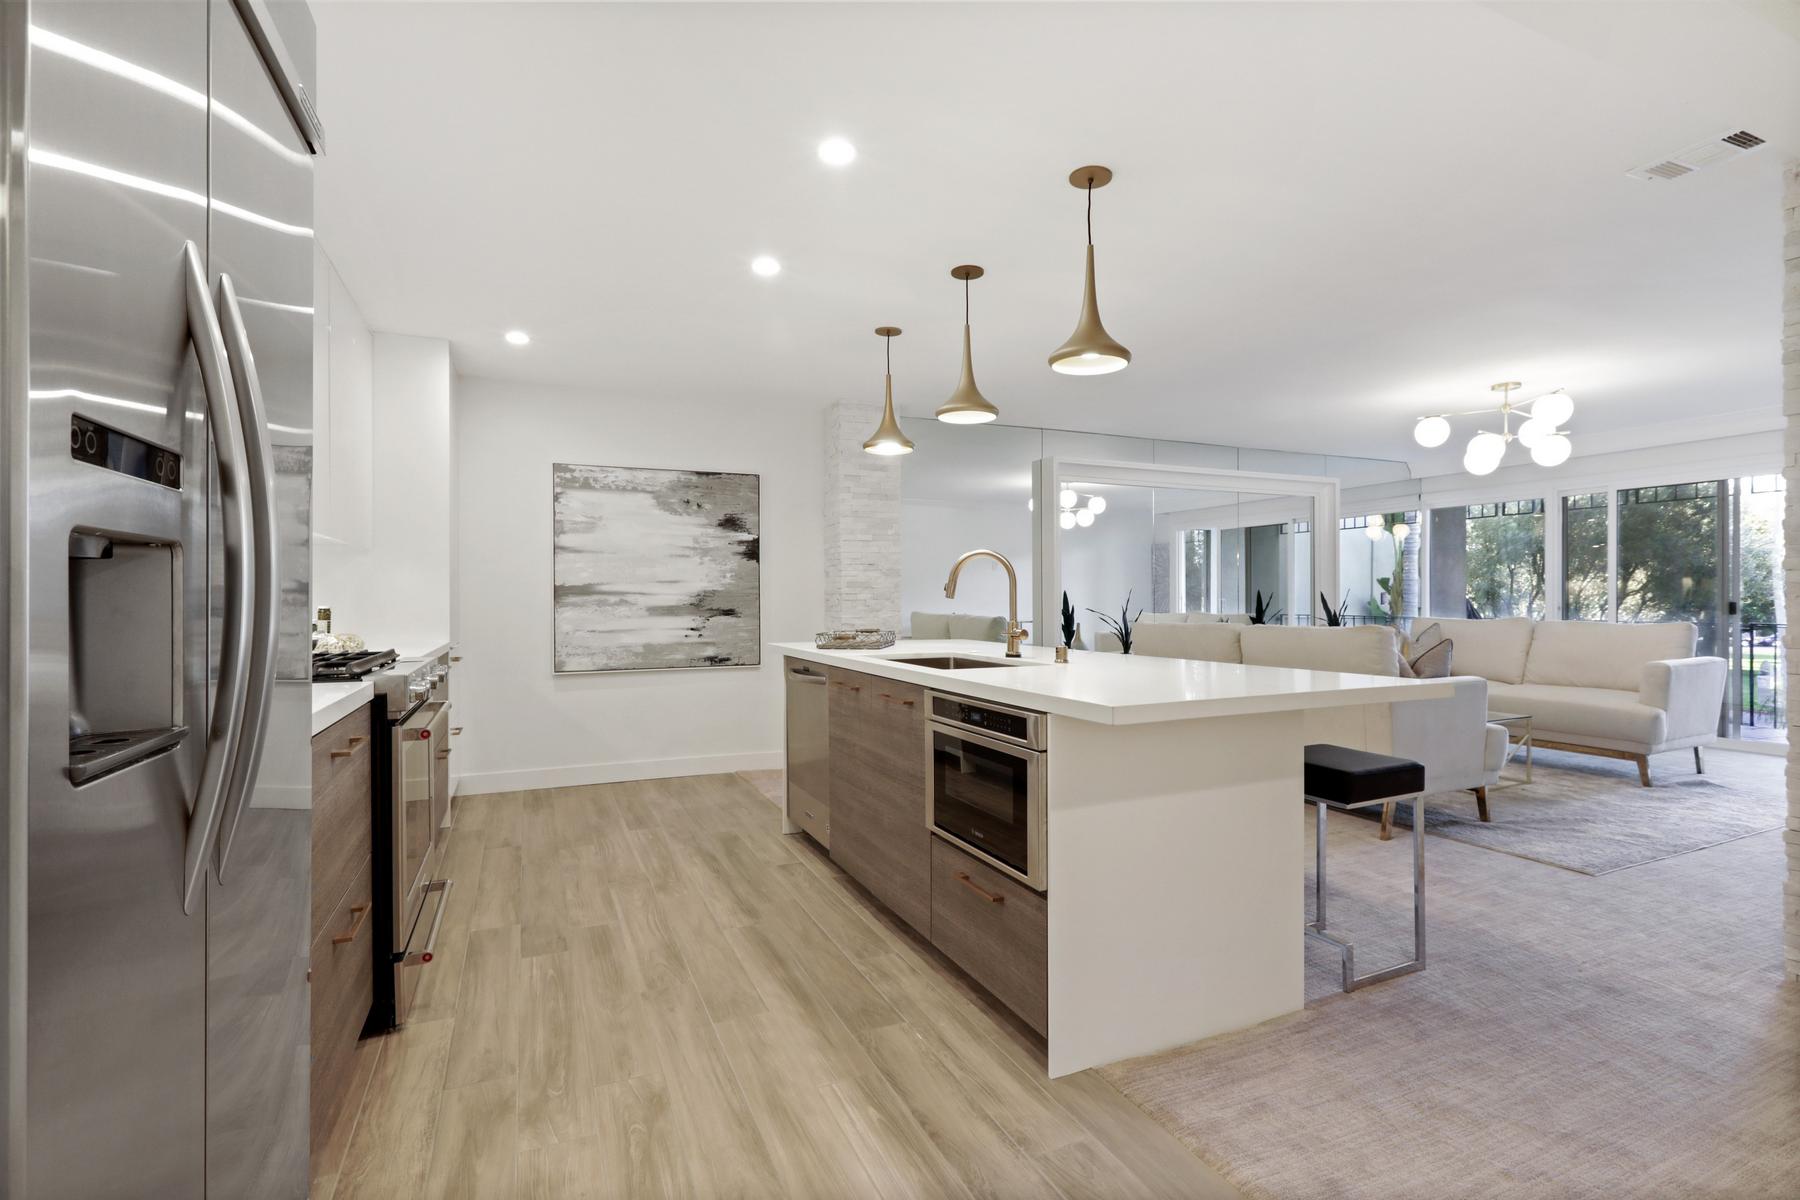 Condominiums for Sale at 1155 Star Park Circle 2C Coronado, California 92118 United States